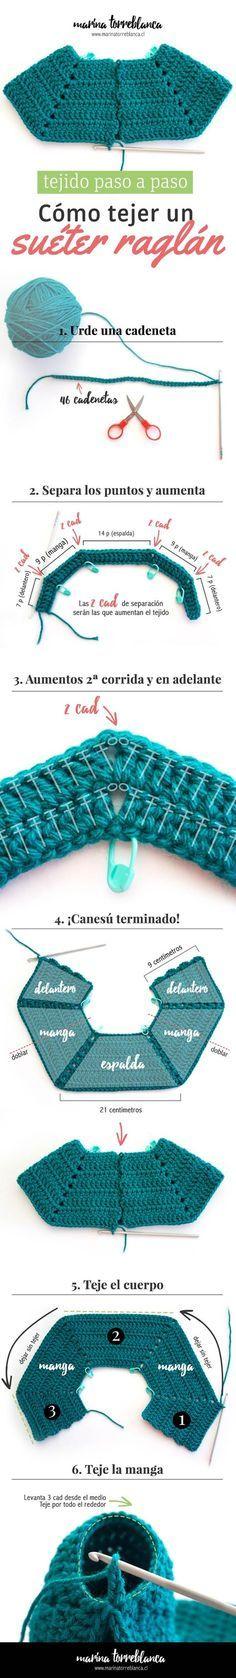 305 best Hermosos tejidos images on Pinterest | Crochet dresses ...